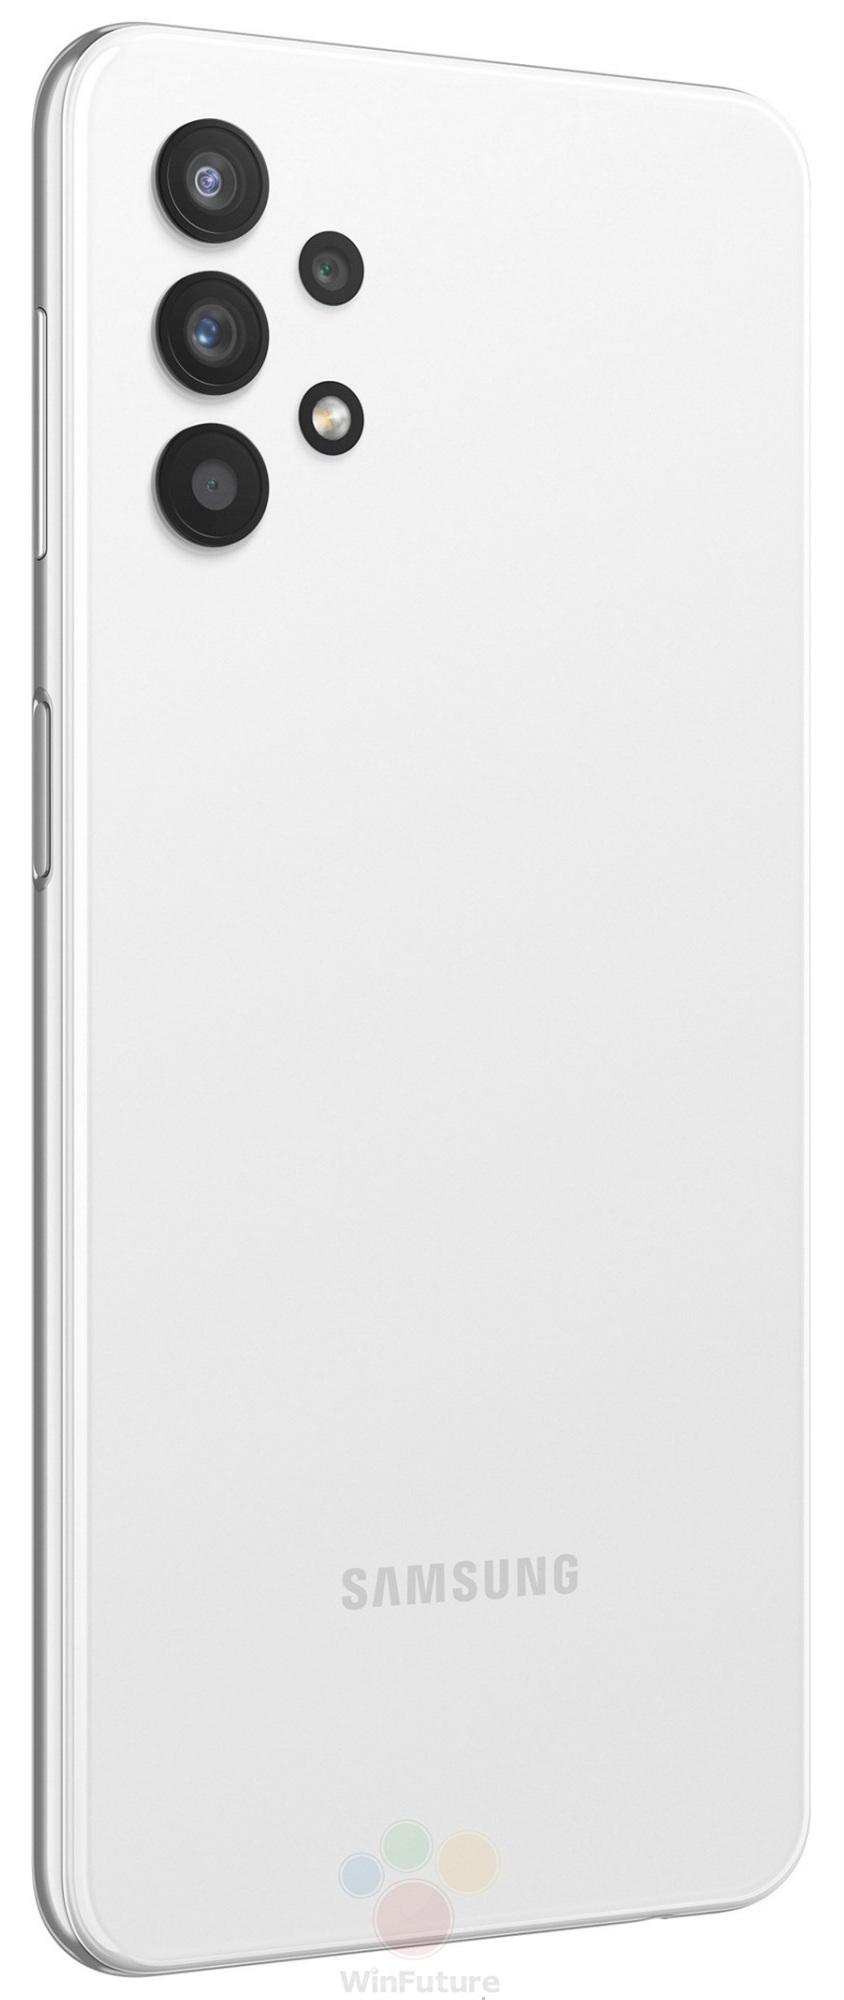 Samsung Galaxy A32: самый доступный смартфон от Samsung с 5G. Фото Samsung  - galaxy_a32_samyj_dostupnyj_samsung_s_5g_bez_bloka_pod_kameru_na_foto_15